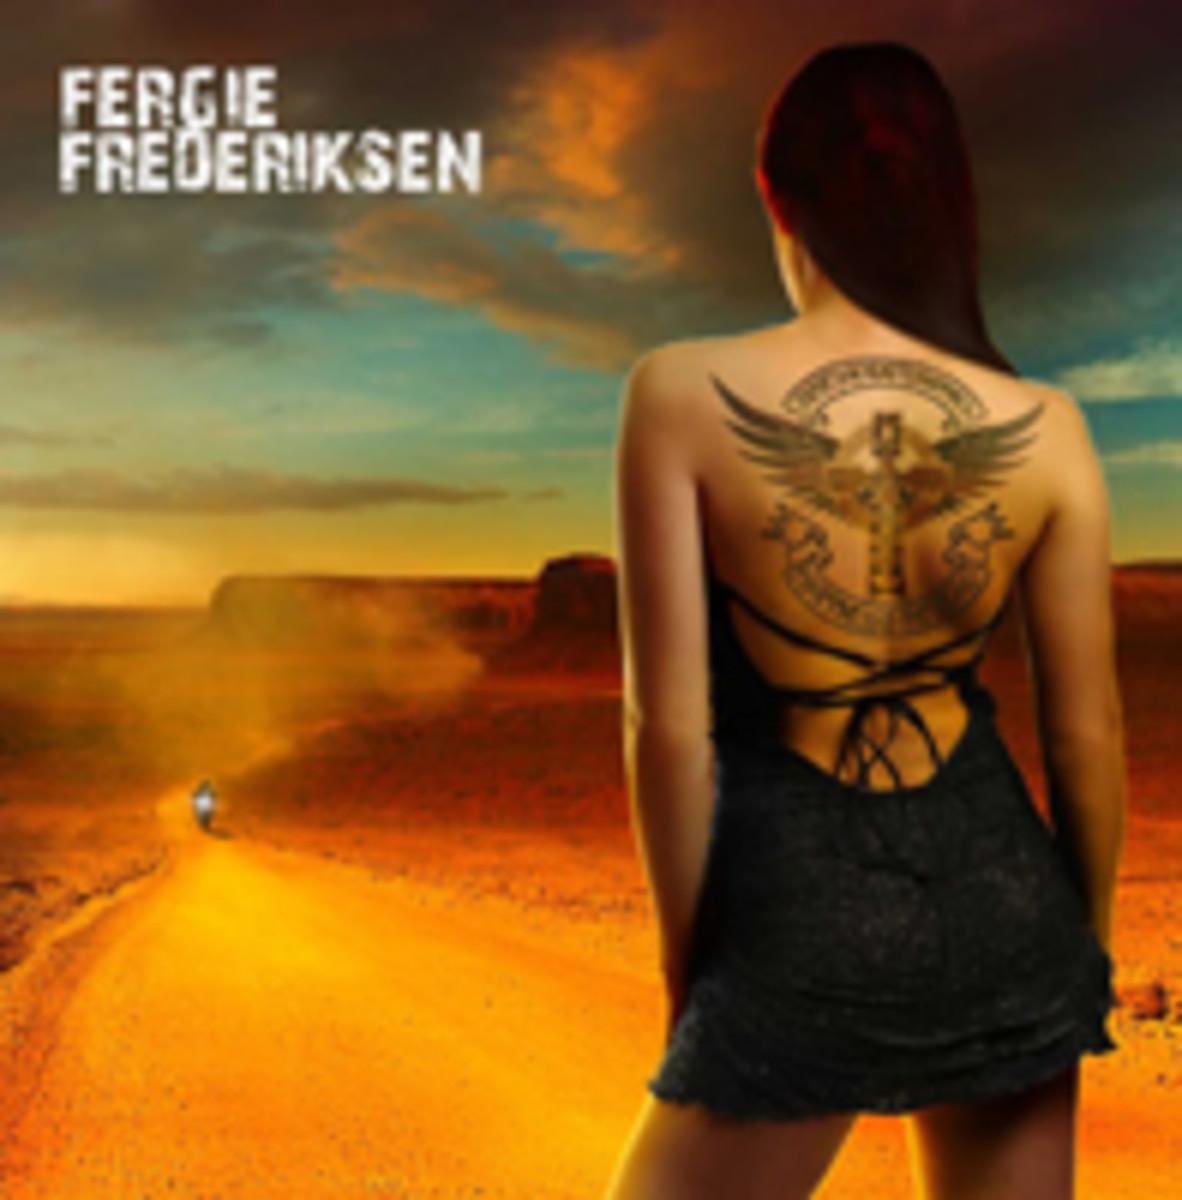 Fergie Fredriksen Happiness Is The Road